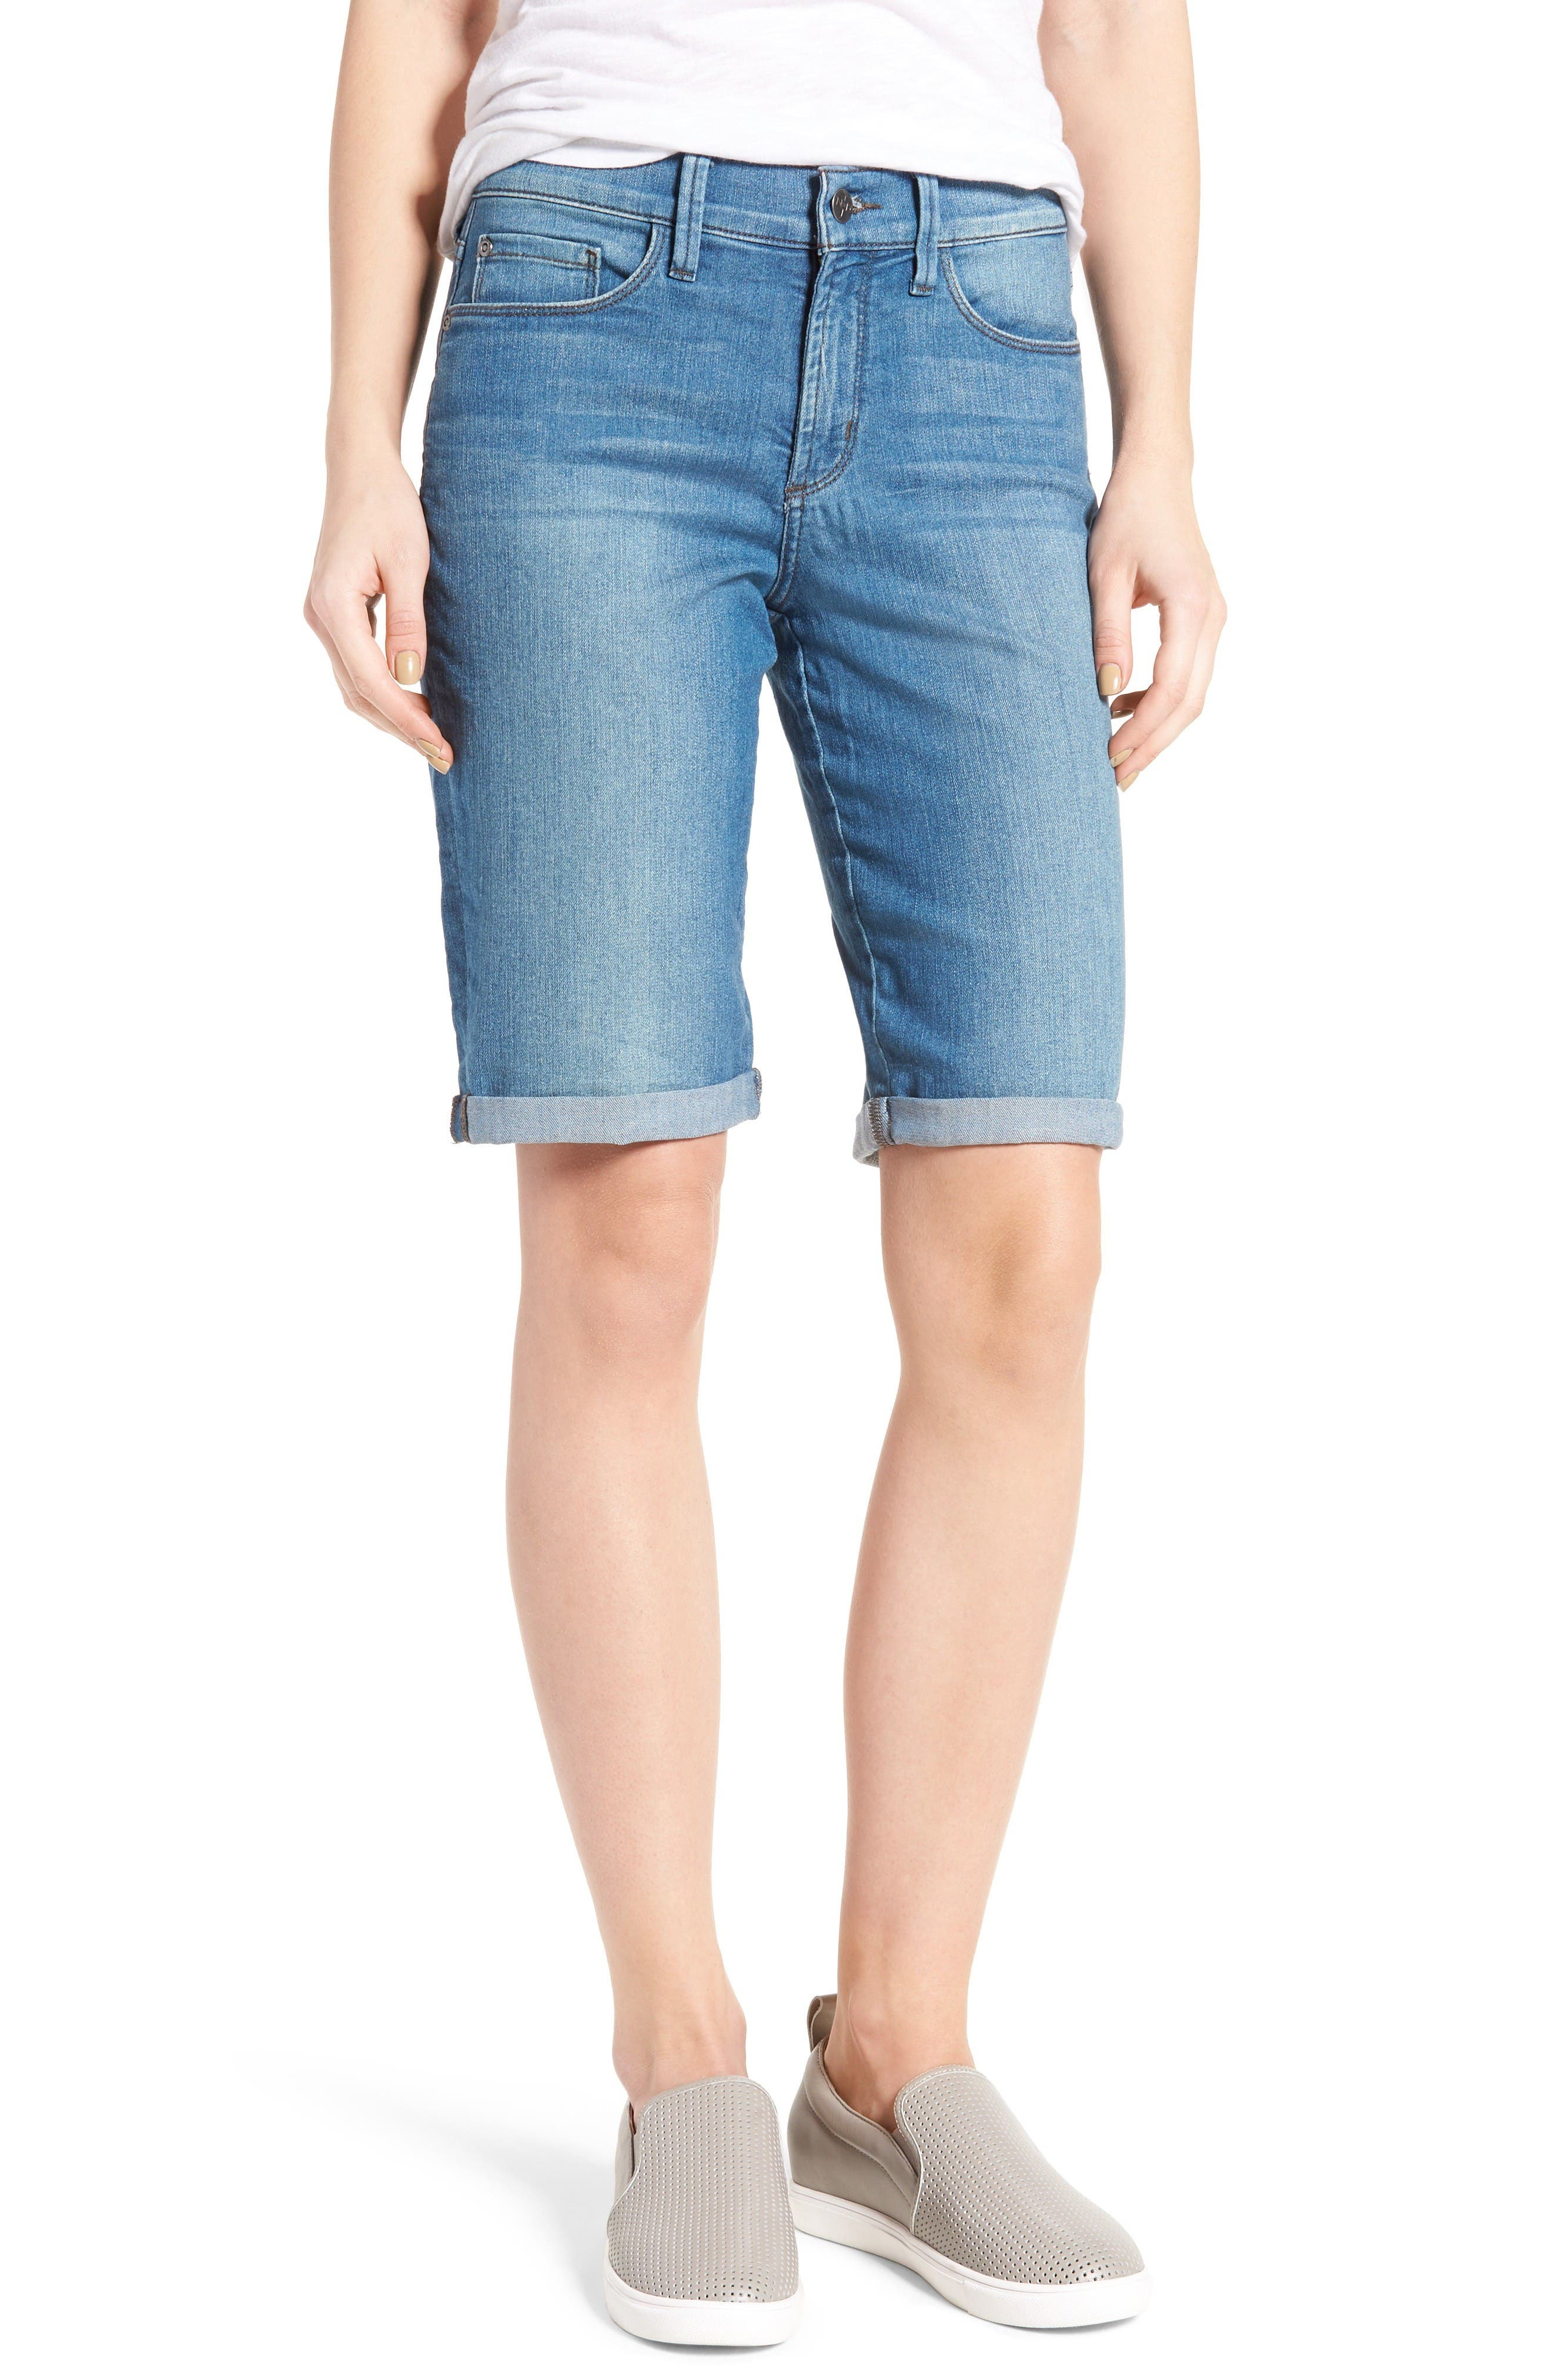 NYDJ Briella Stretch Denim Roll Cuff Shorts (Jet Stream) (Regular & Petite)